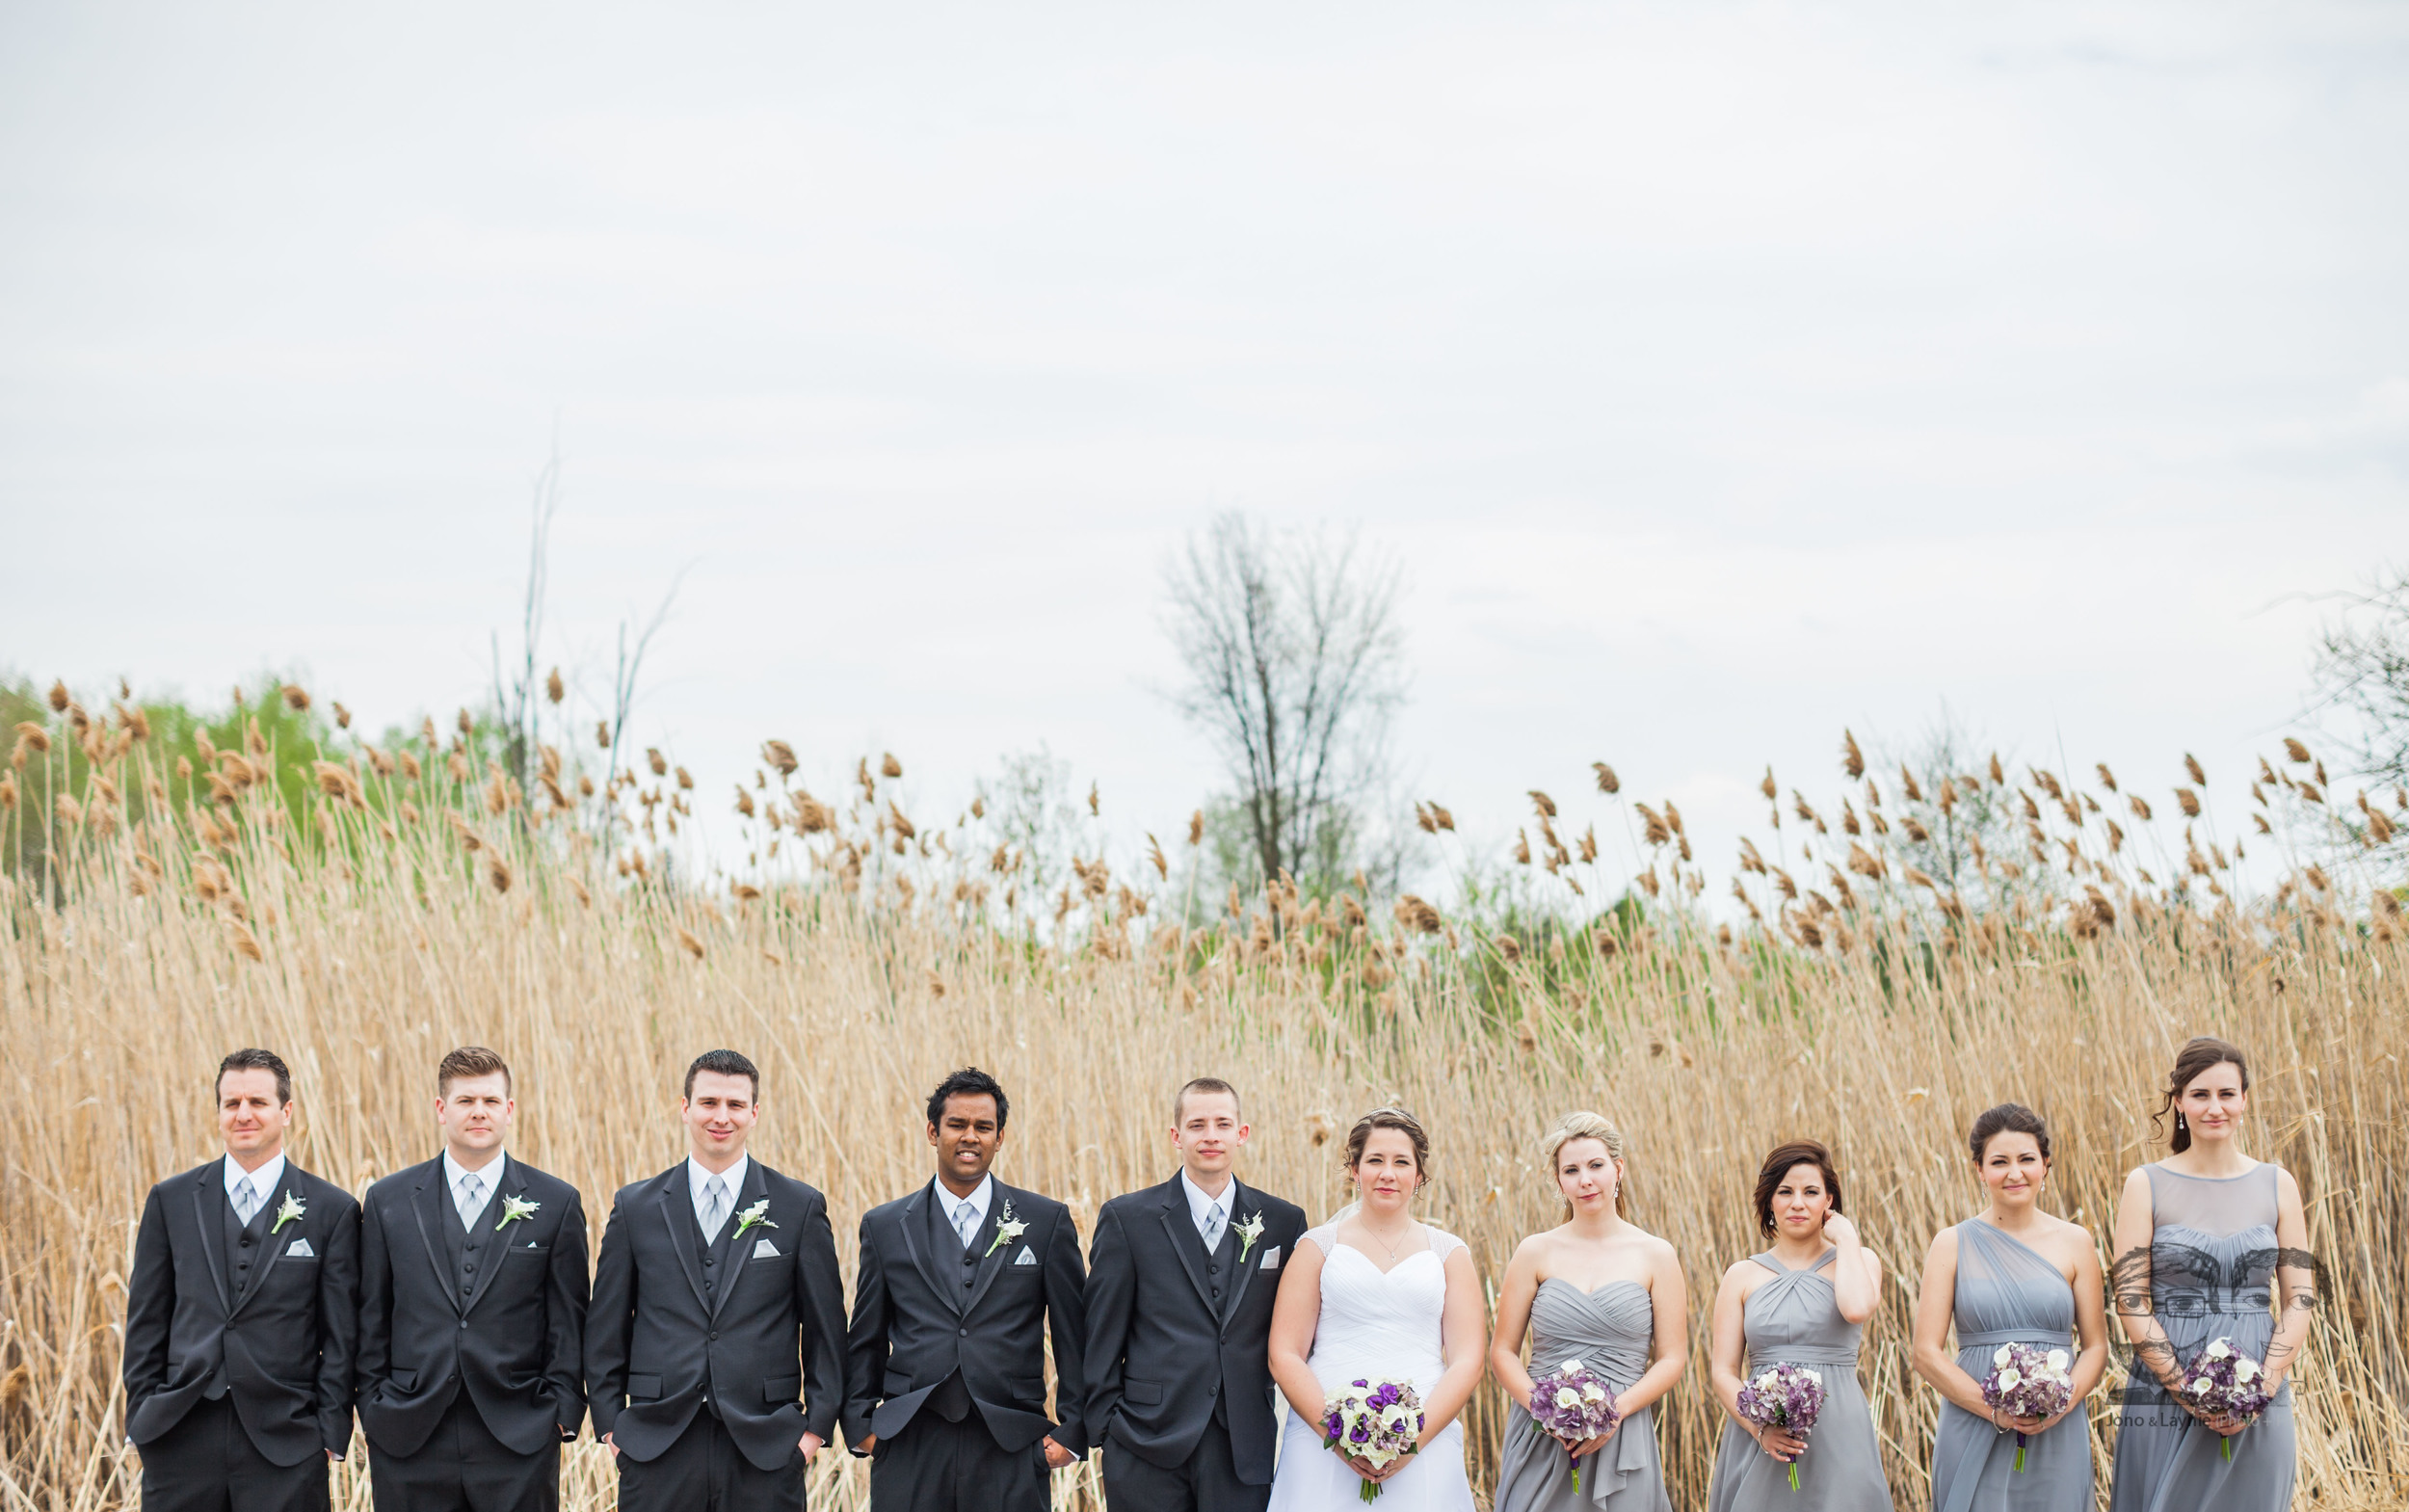 20Toronto Wedding Photographers and Videographers-Jono & Laynie Co.-Orangeville Wedding.jpg